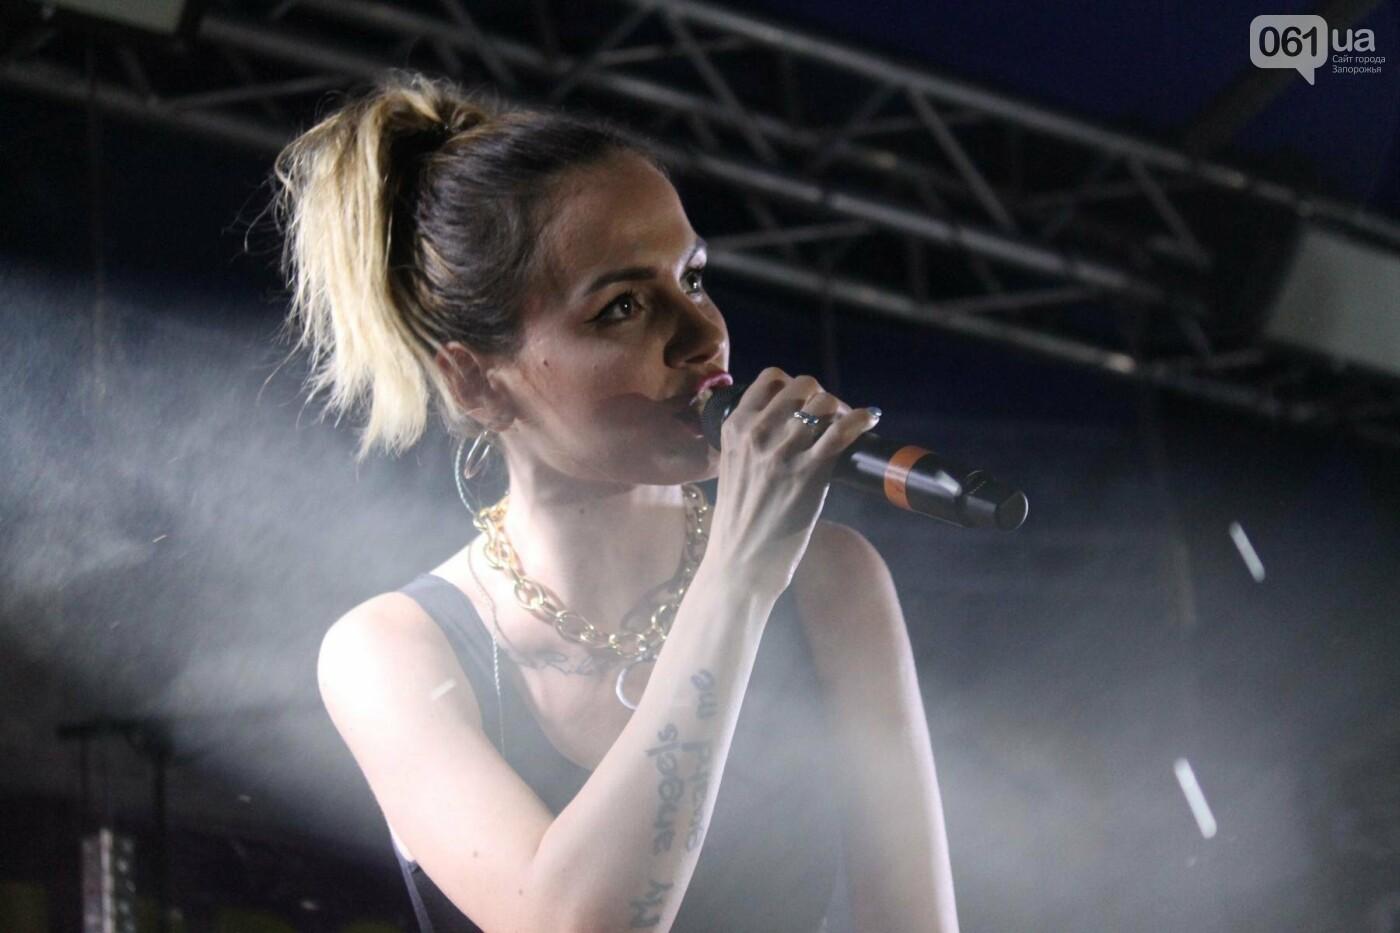 ALEKSEEV, «Агонь» и MamaRika: в Запорожье звезды устроили яркий концерт на «Miss AVRORA Summer 2018», – ФОТОРЕПОРТАЖ, фото-1